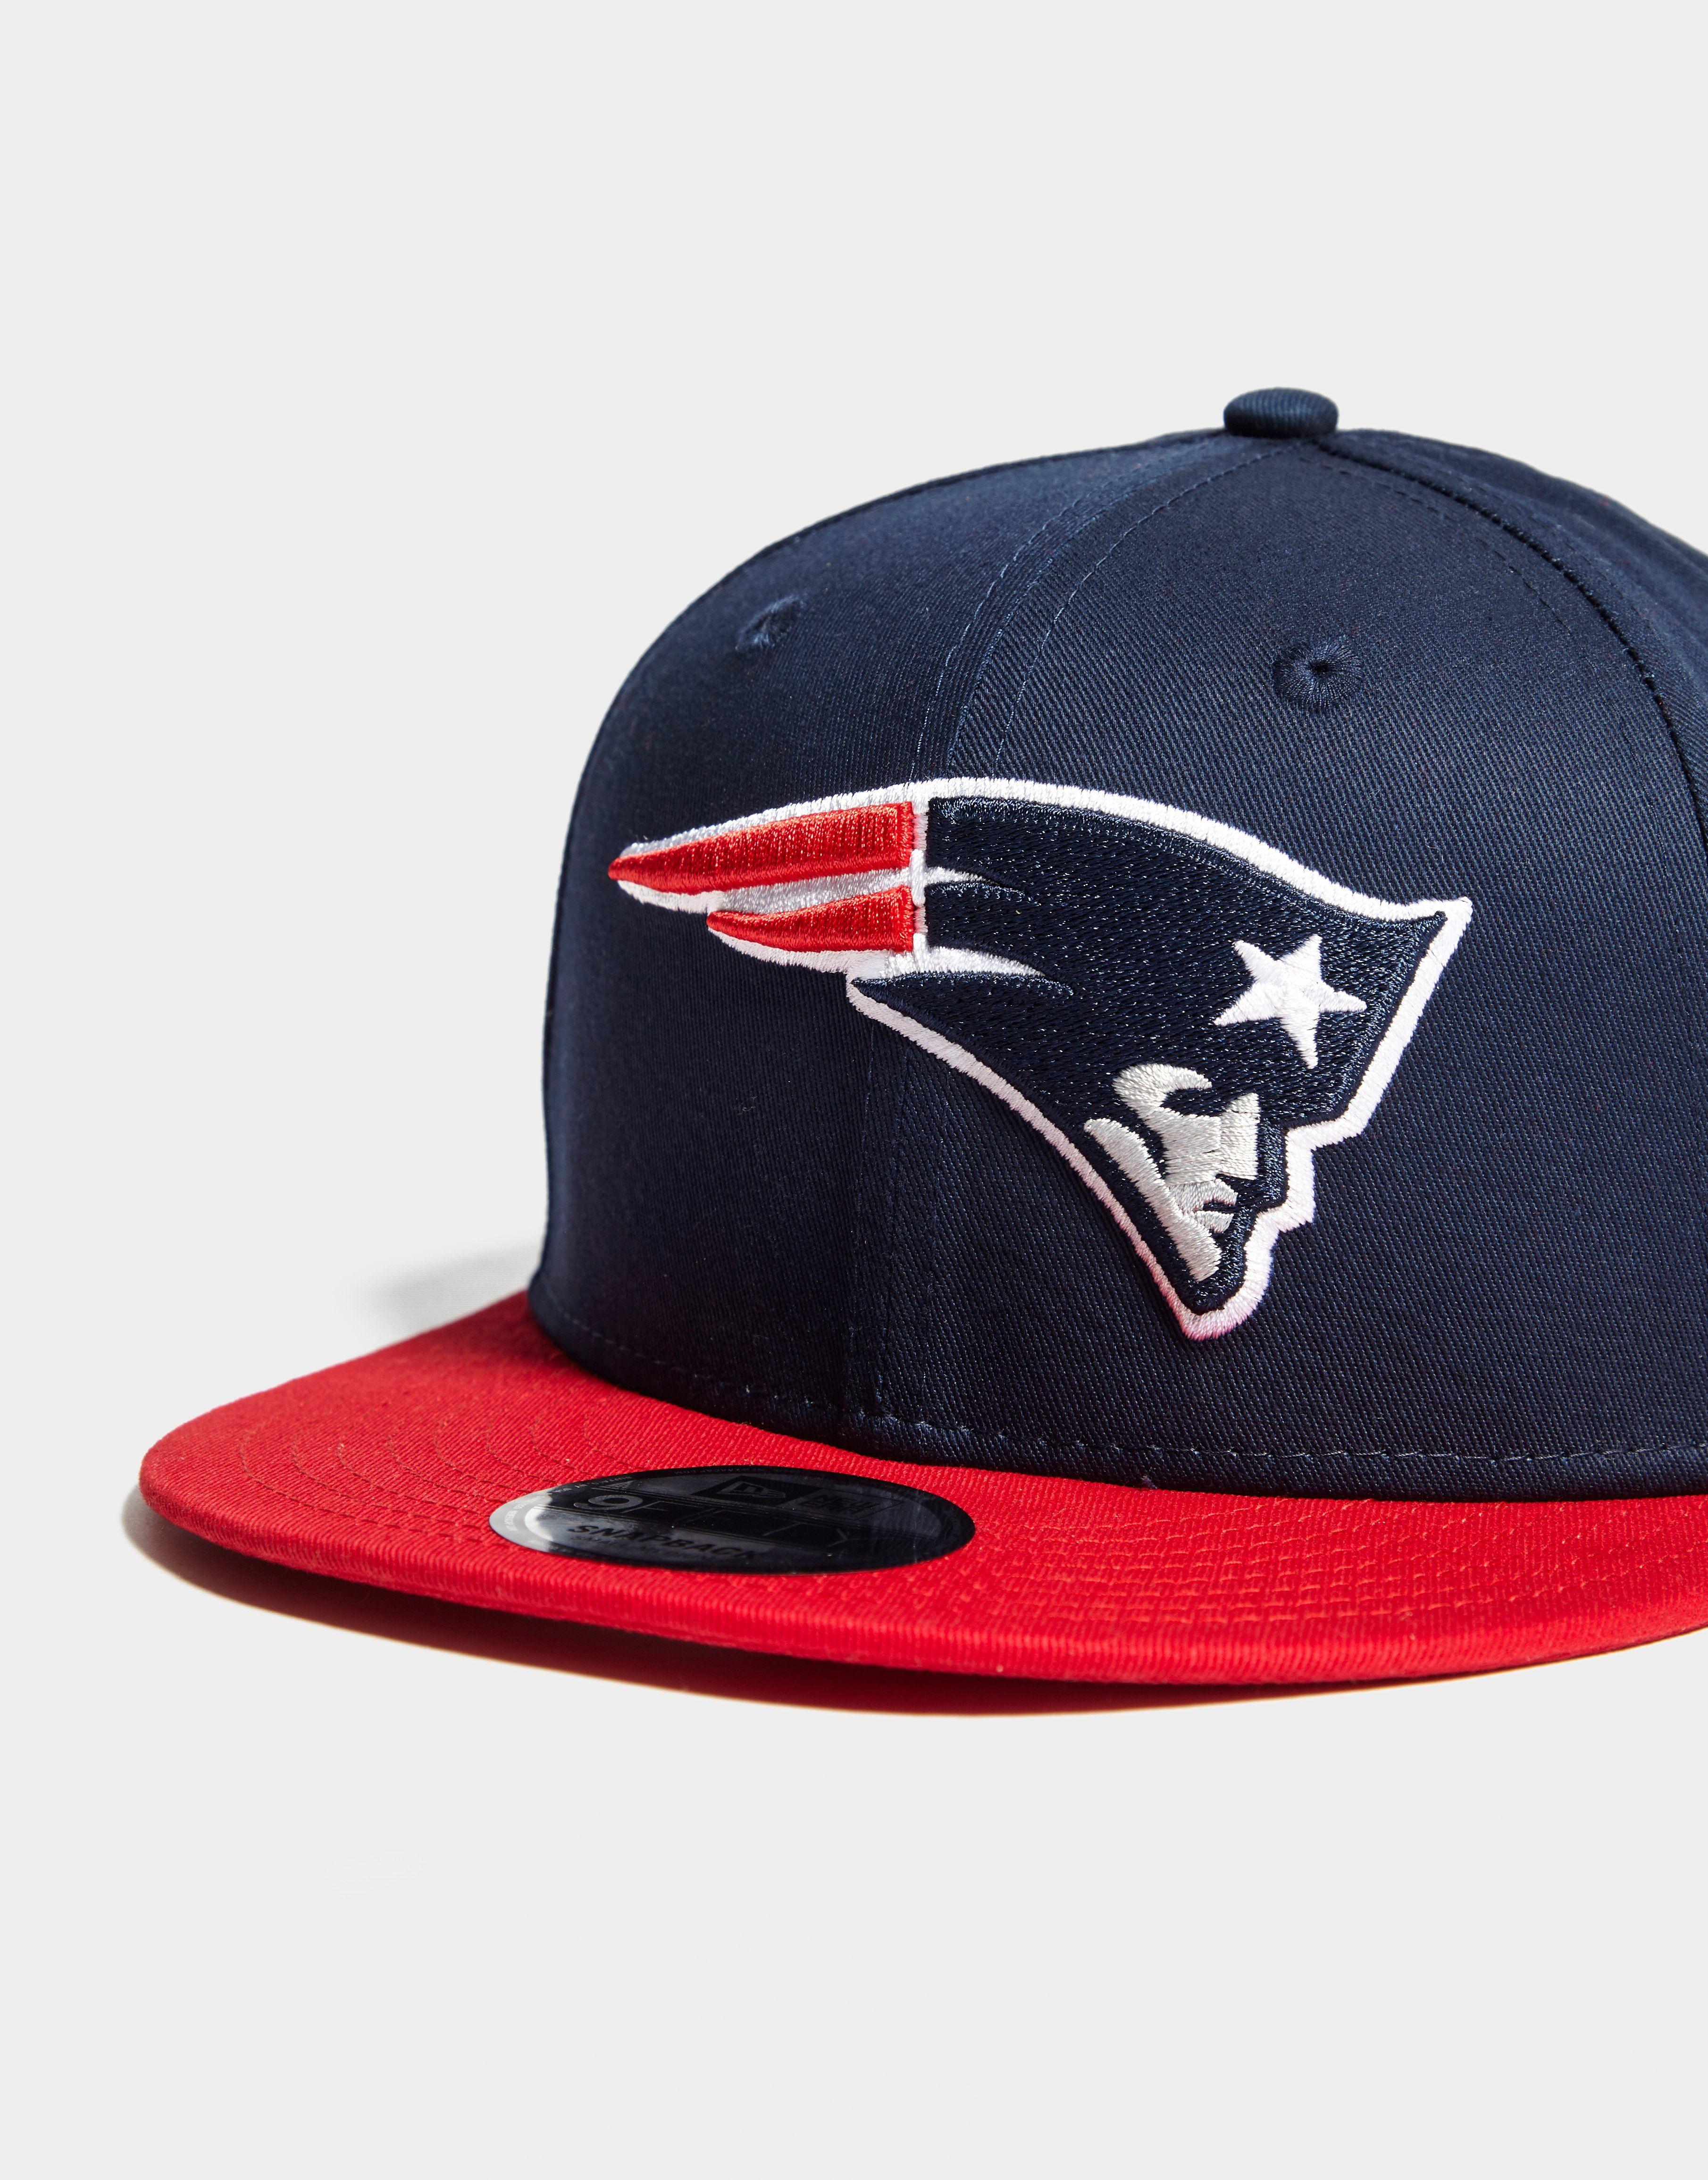 New Era Casquette NFL New England Patriots 9FIFTY